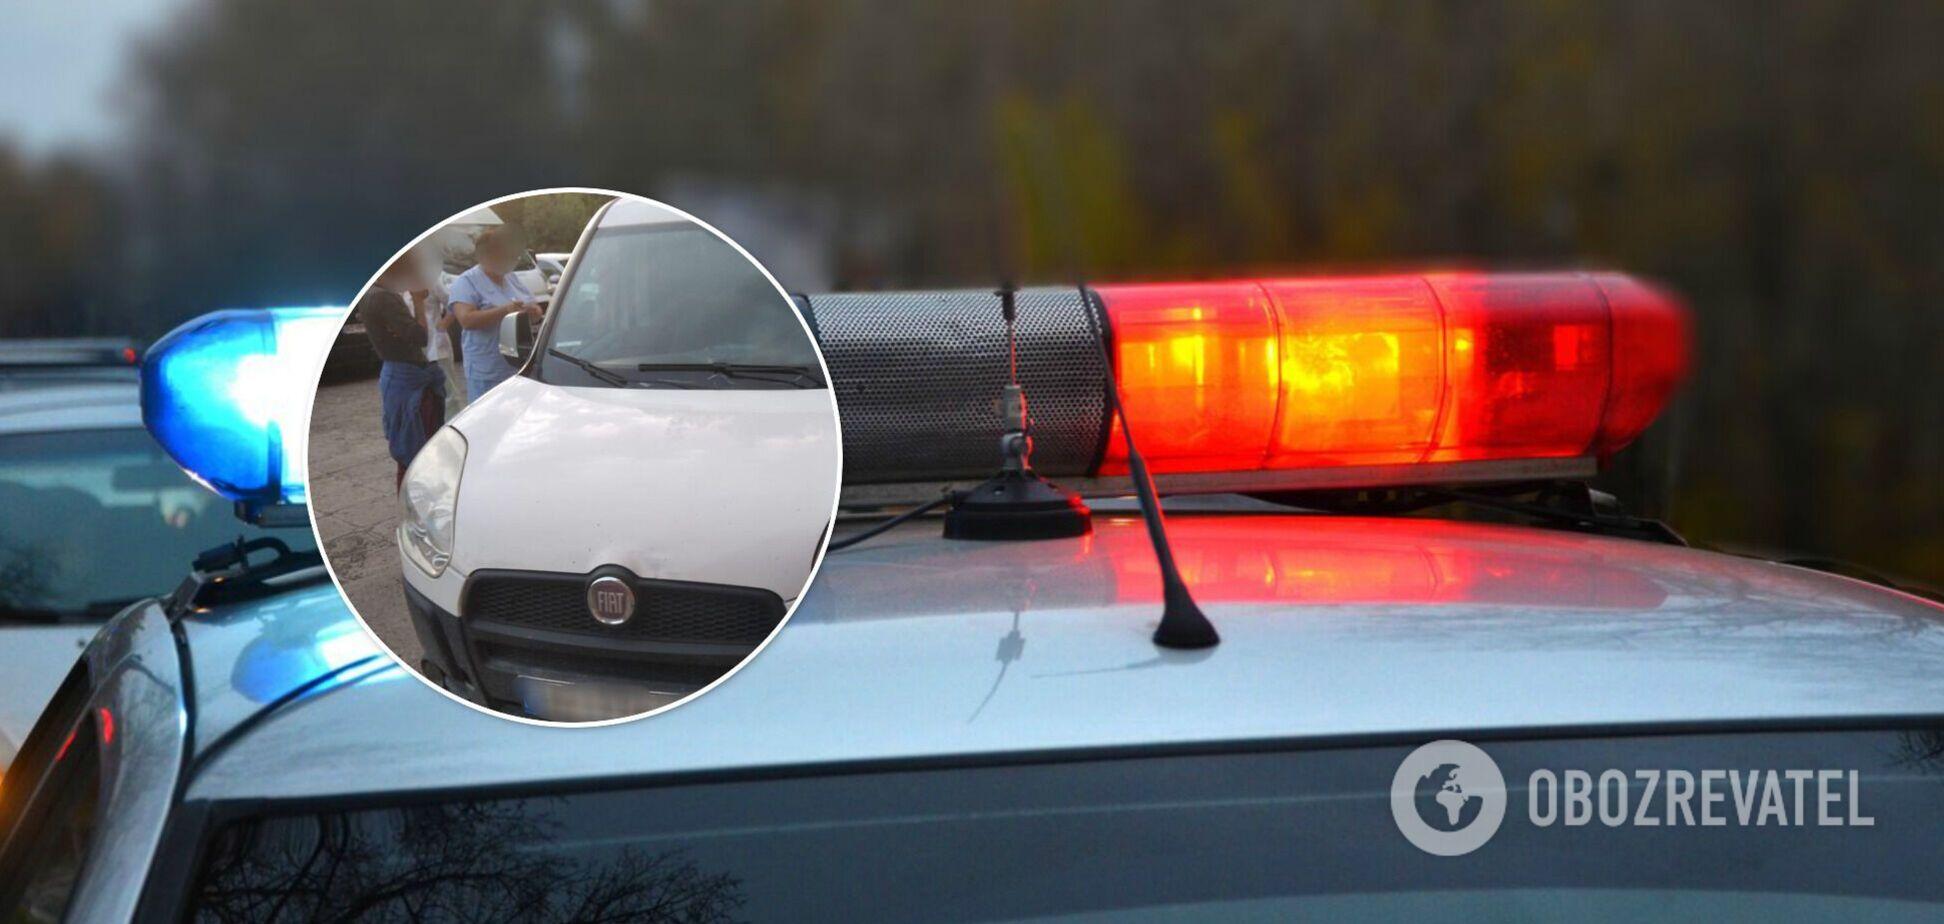 На Закарпатье под колесами авто погибла 2-летняя девочка. Фото